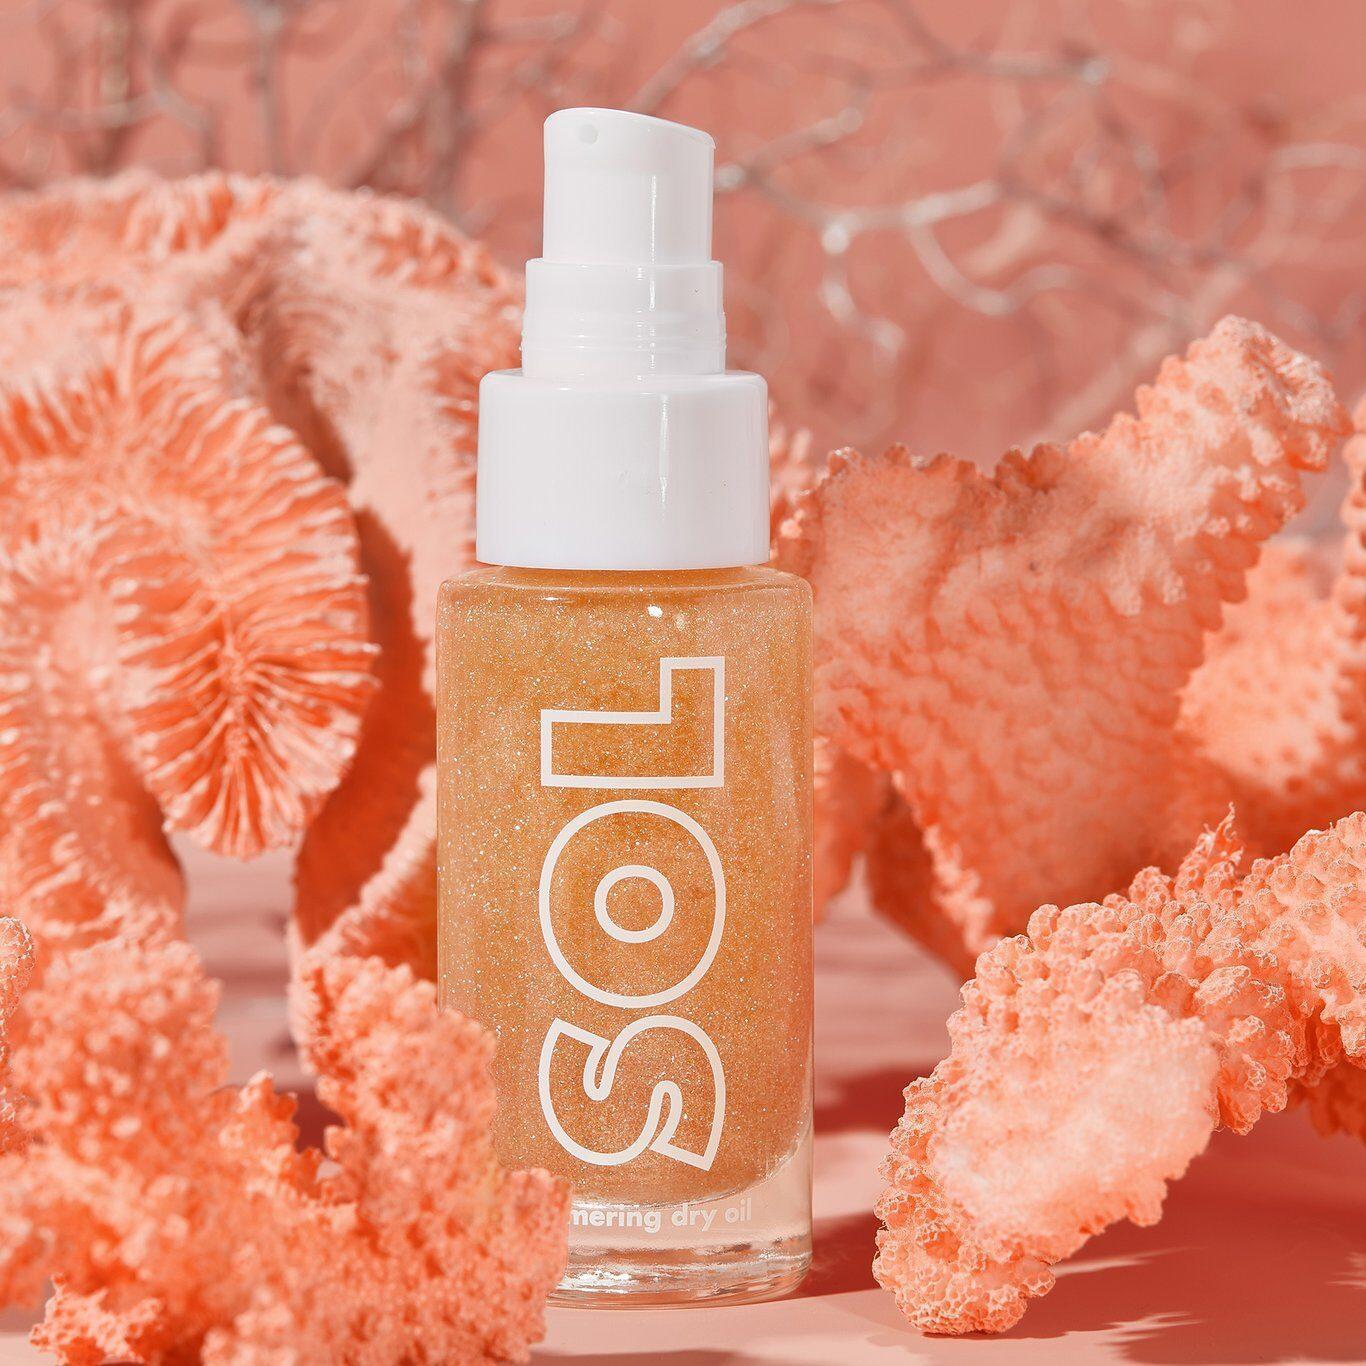 Colourpop Coast To Coral Collection SOL BODY Paloma Sol Shimmering Dry Oil Mini Promo